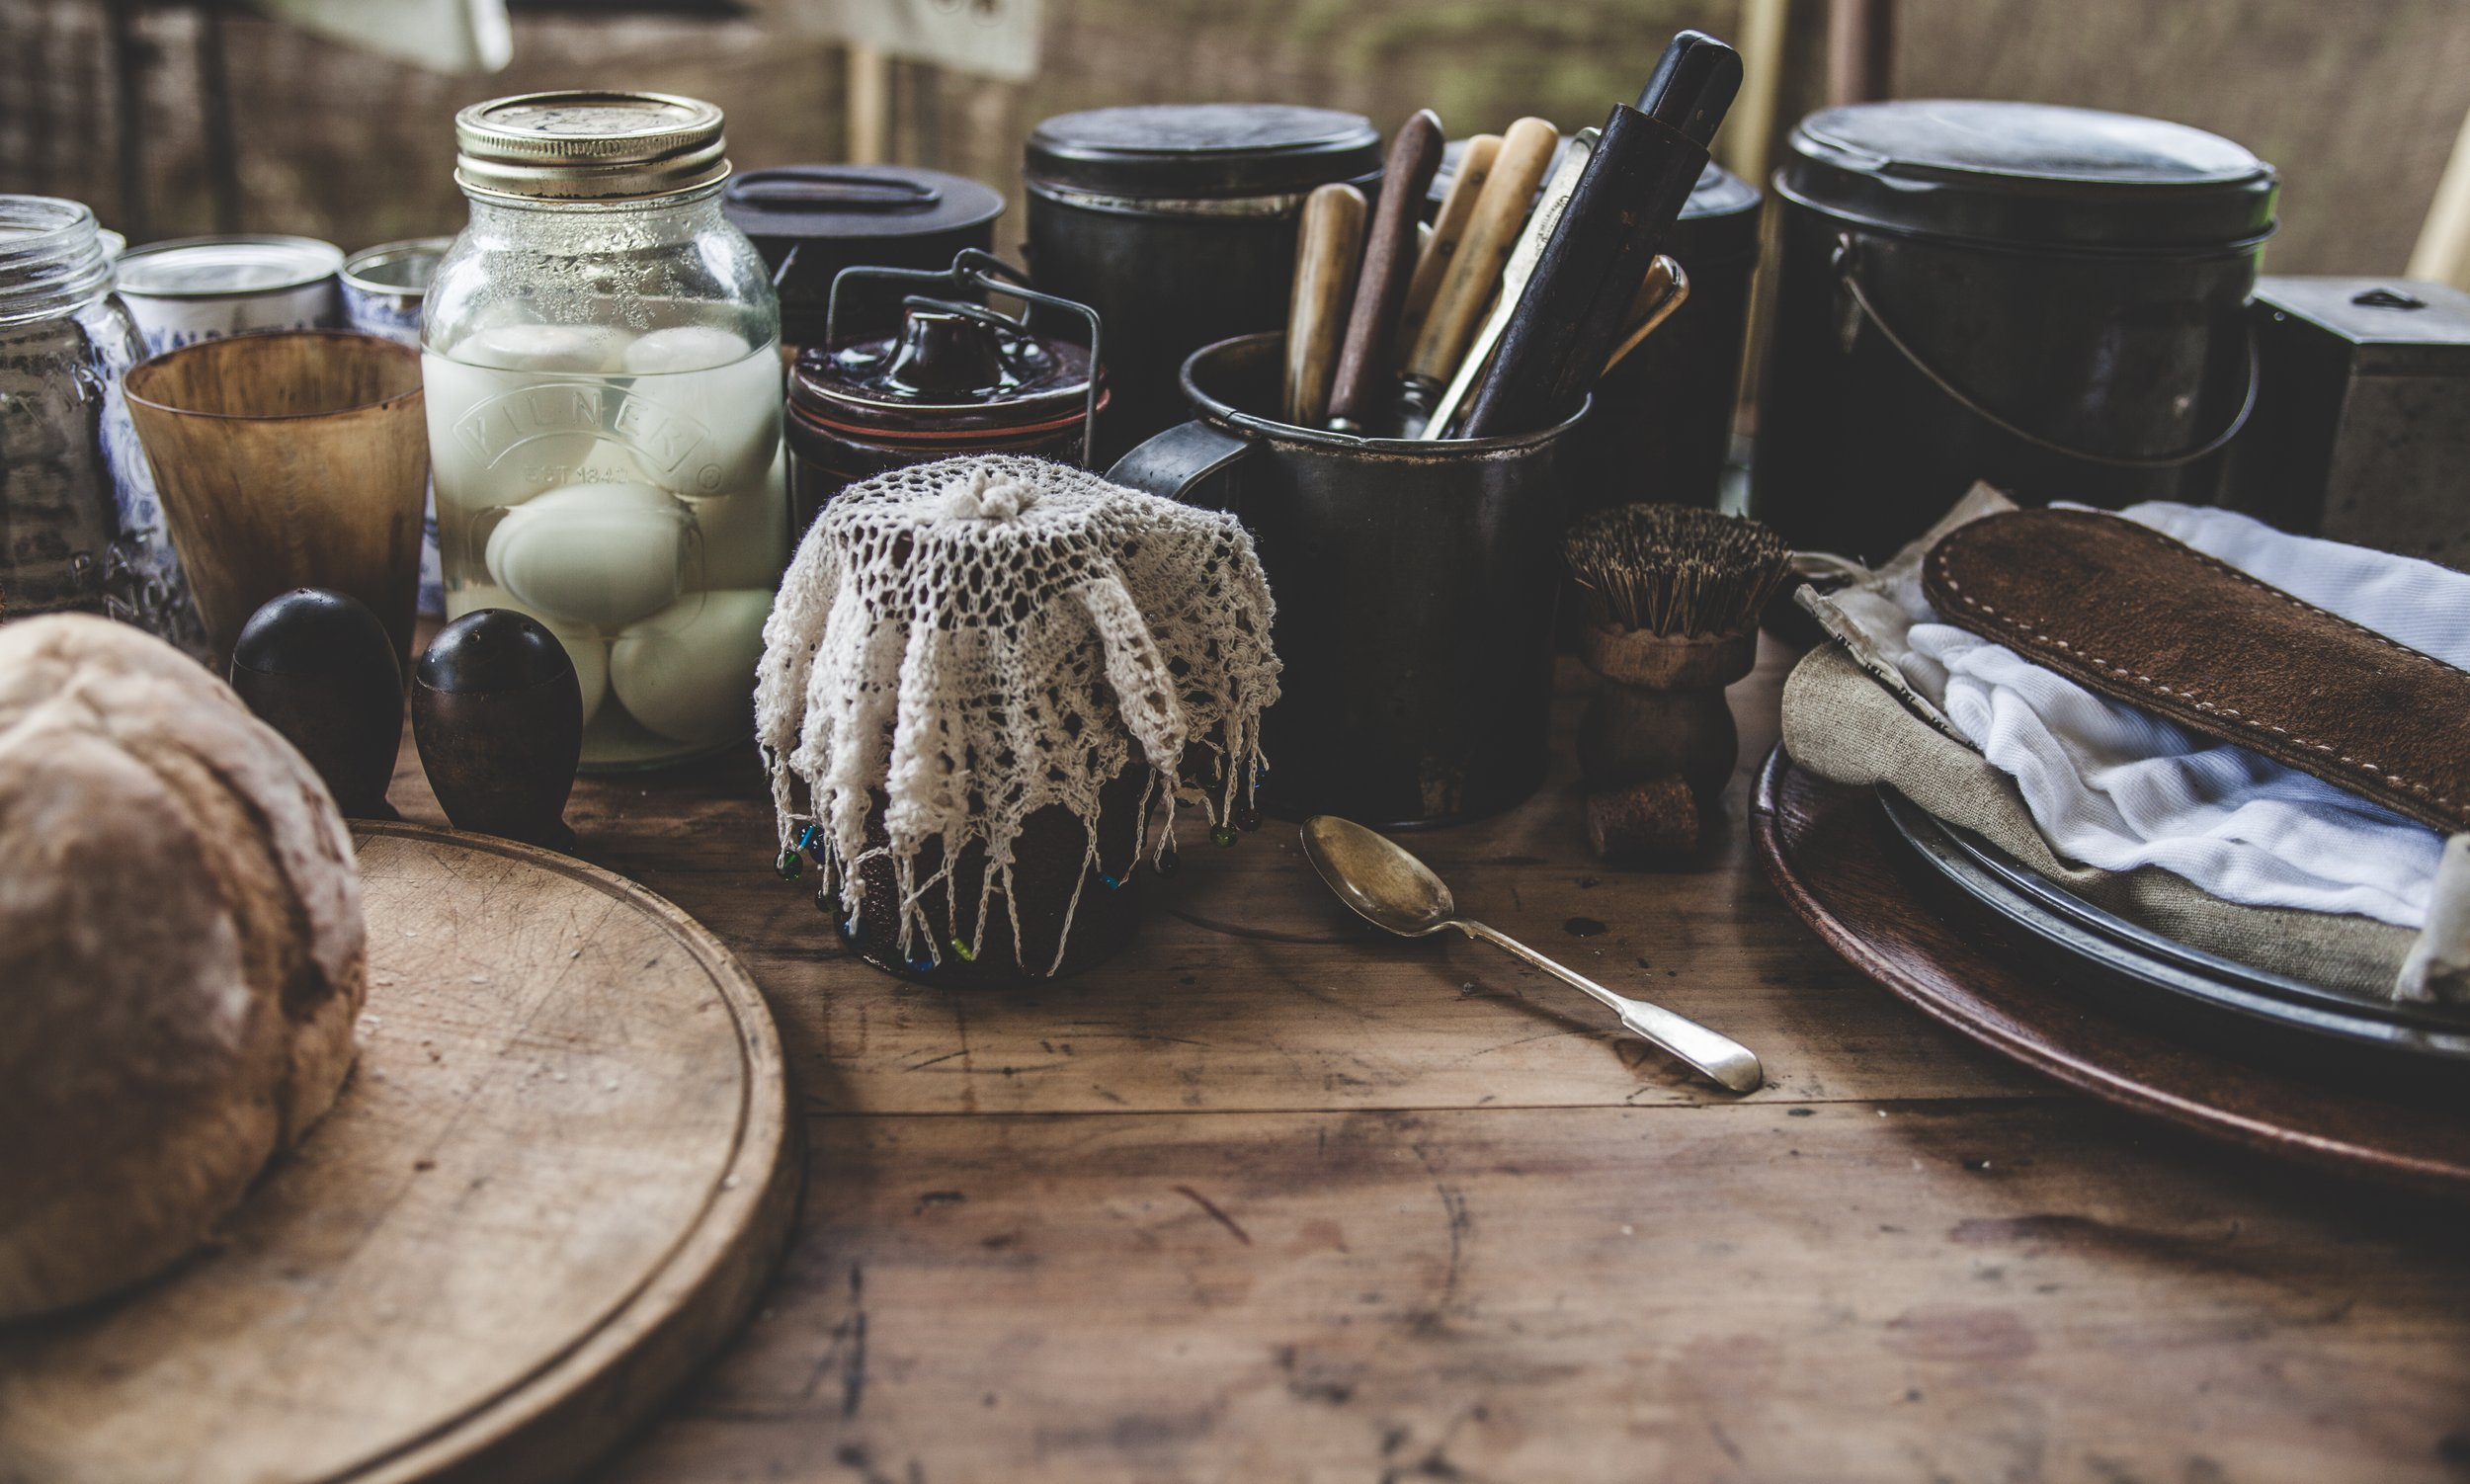 negative-space-rustic-kitchen-utensils-clem-onojeghuo.jpg